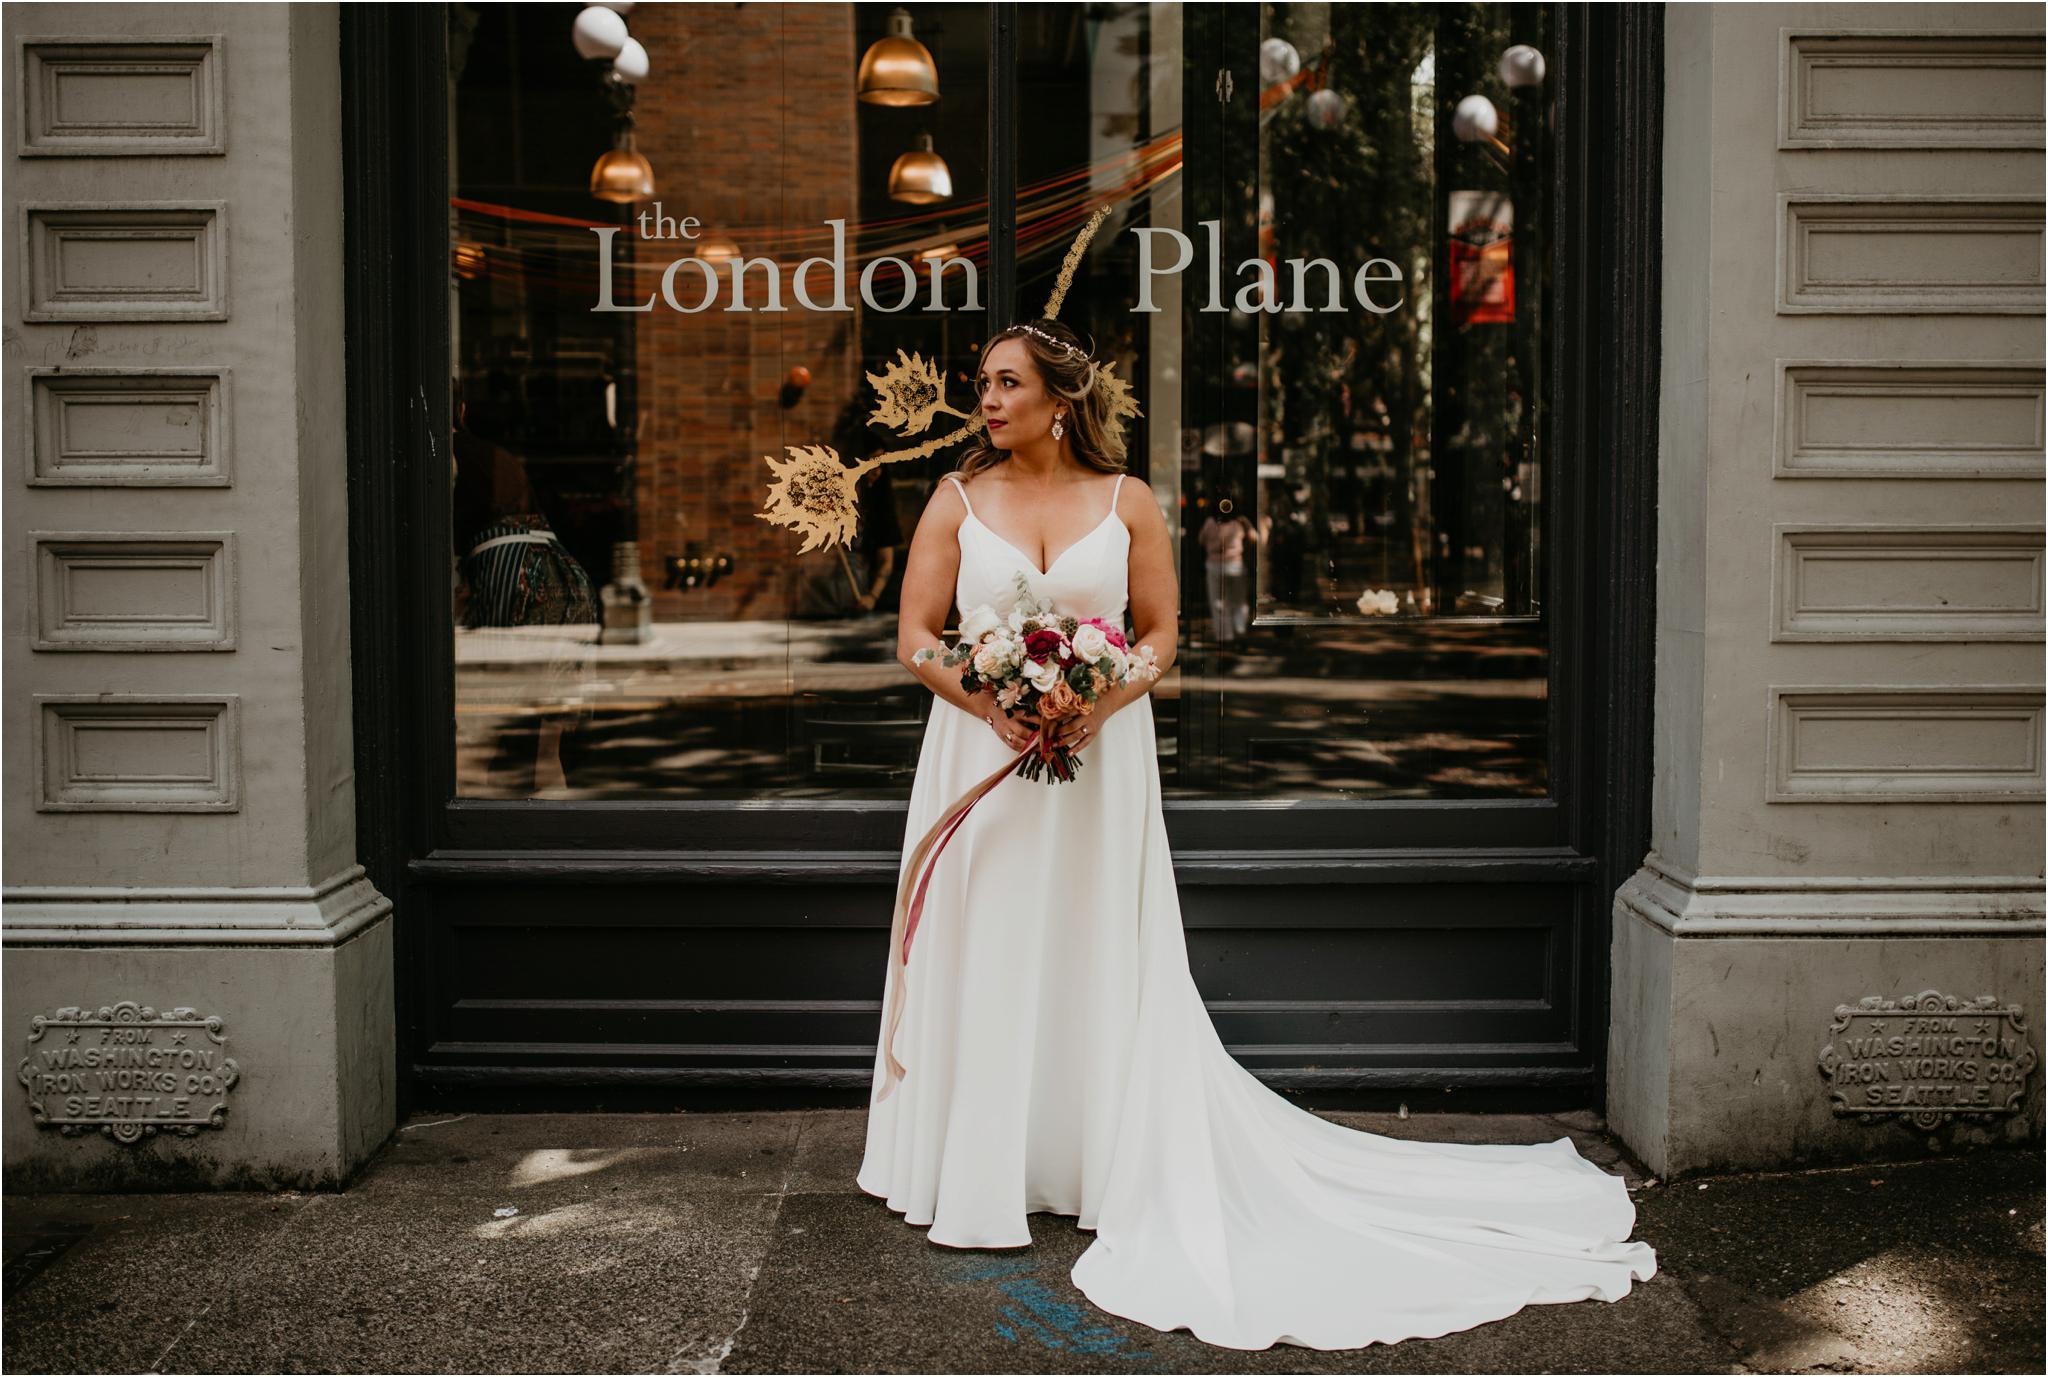 laura-and-matt-metropolist-urban-seattle-wedding-photographer-056.jpg